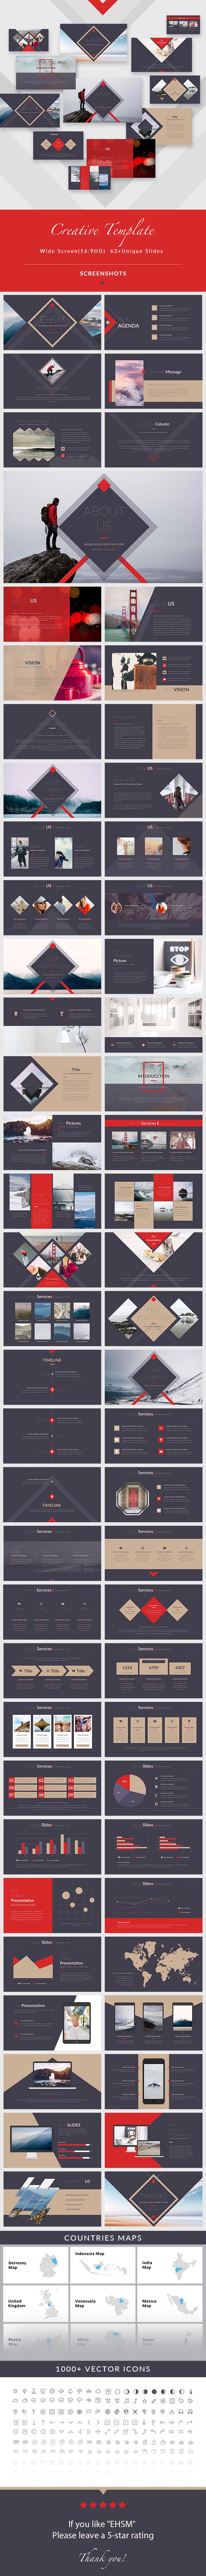 EHSM - Creative PowerPoint Presentation Template - Creative PowerPoint Templates